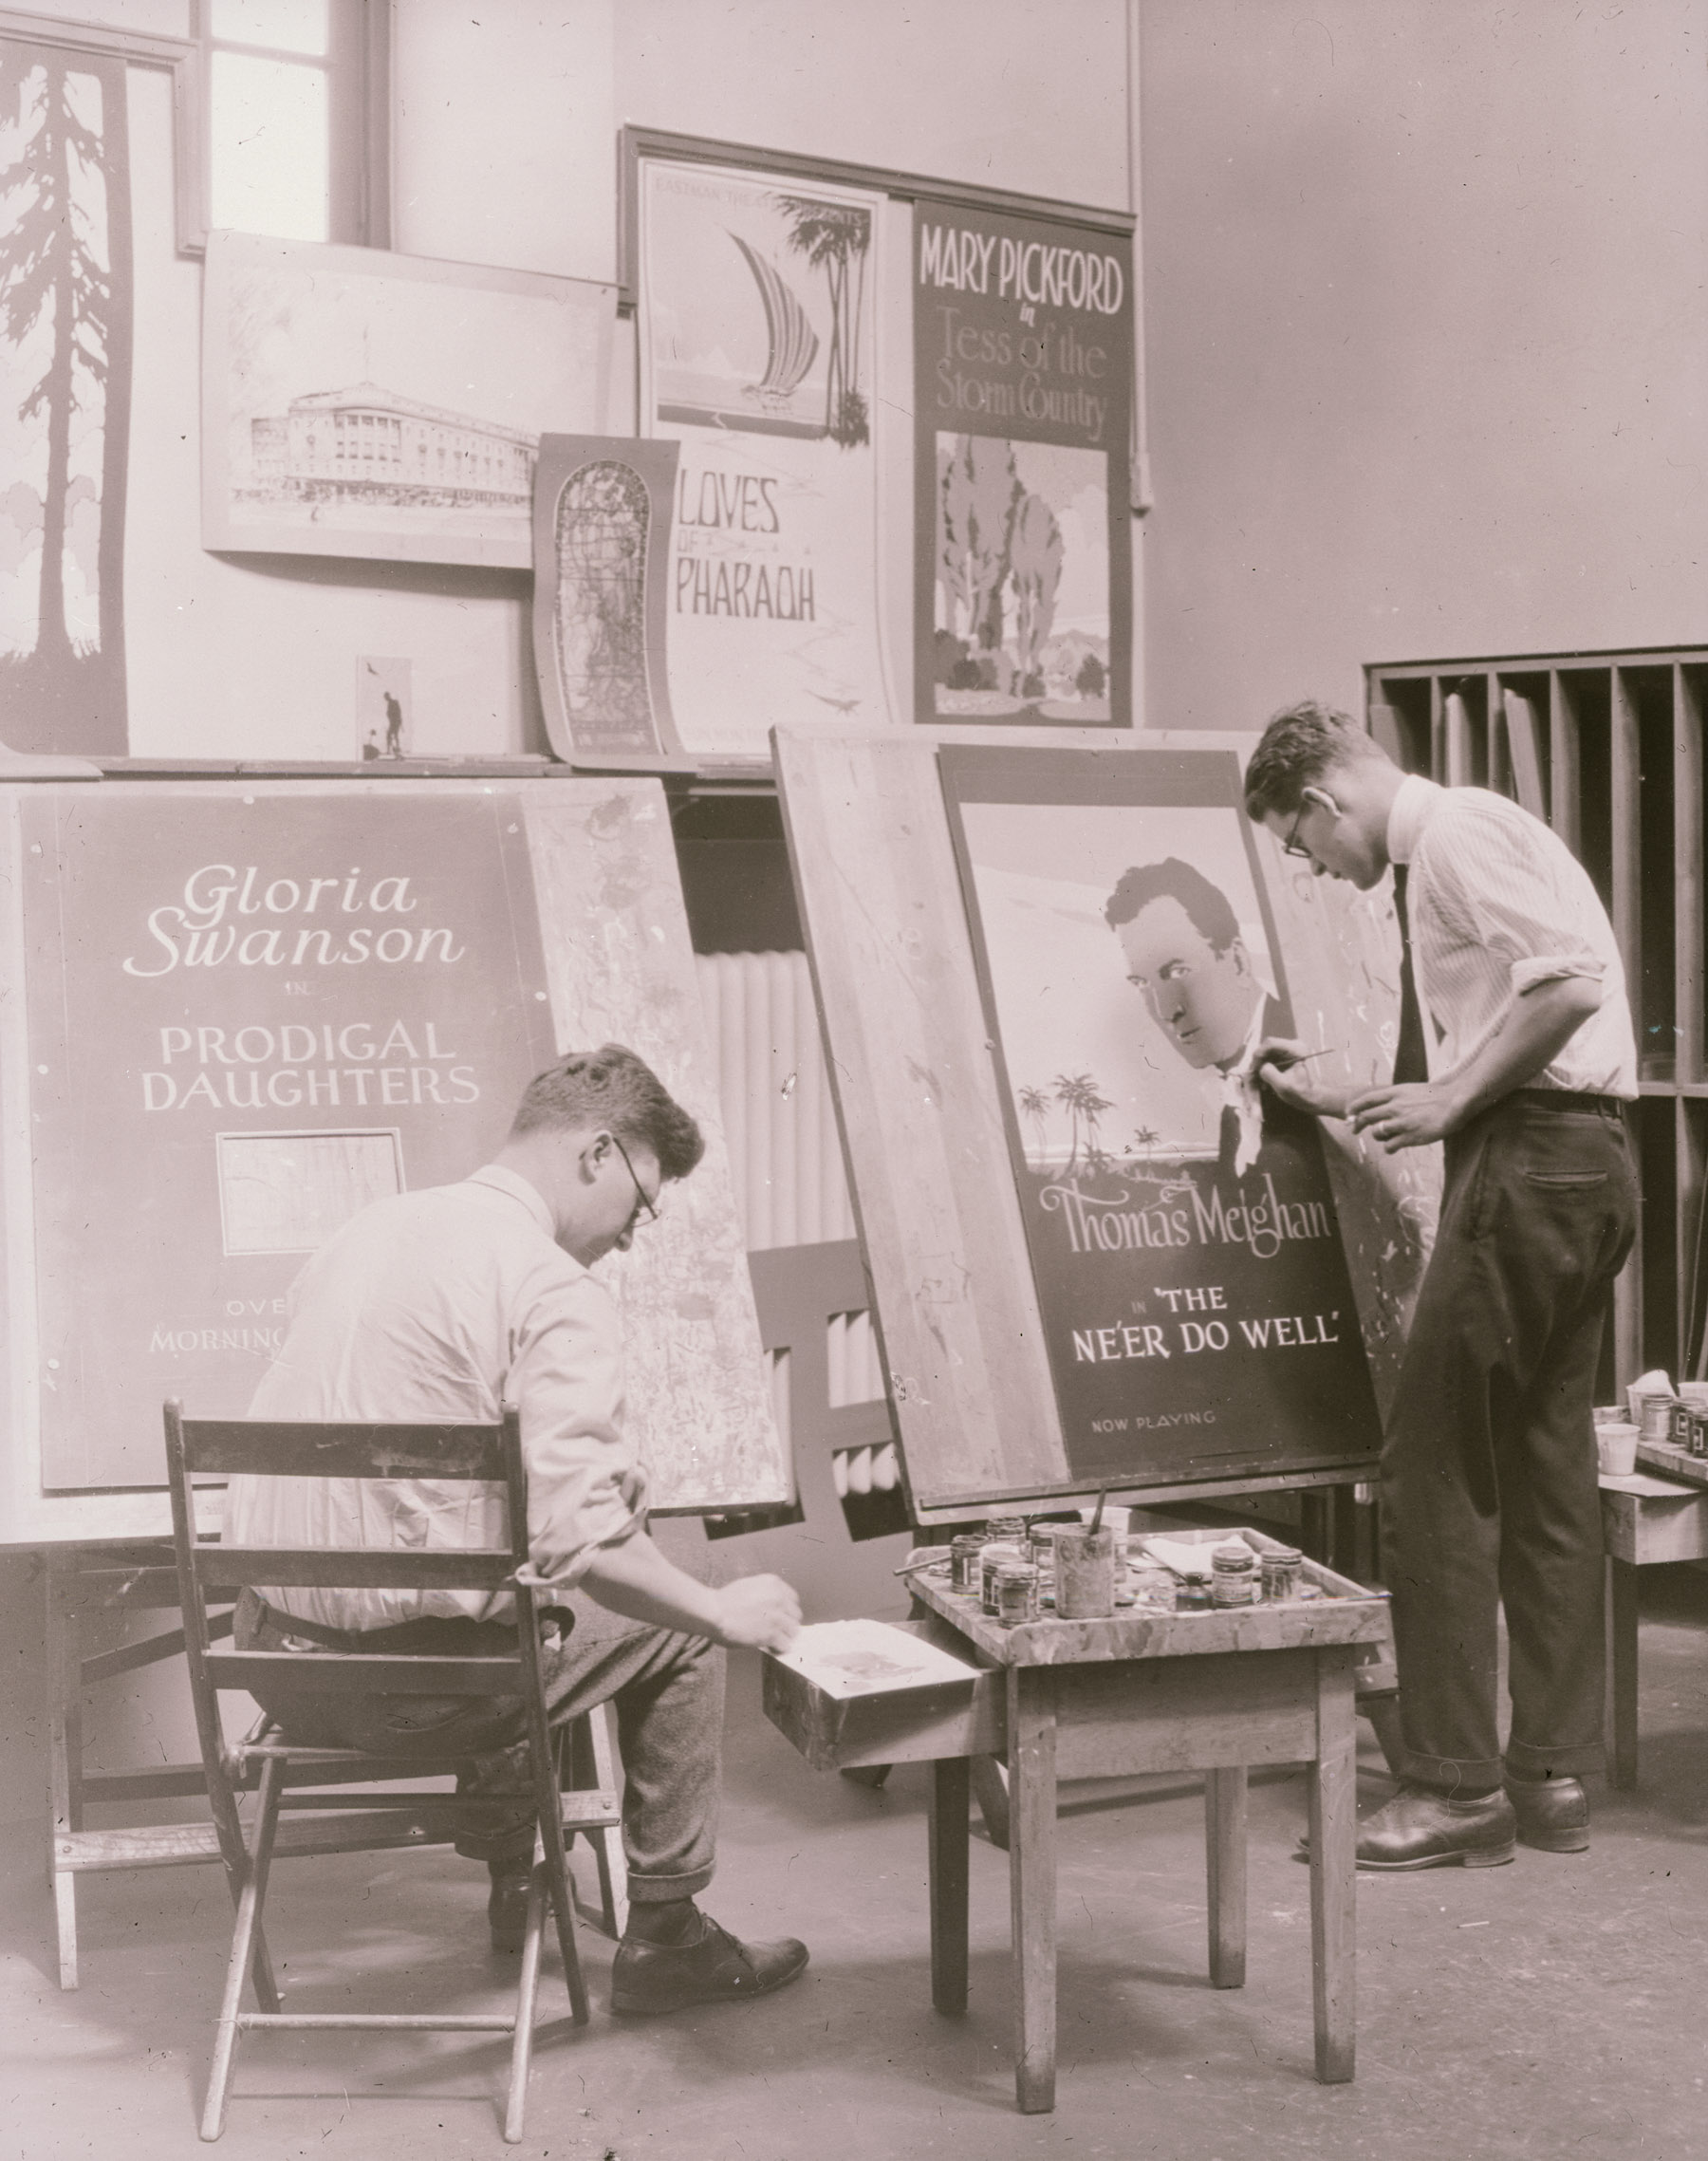 poster designers